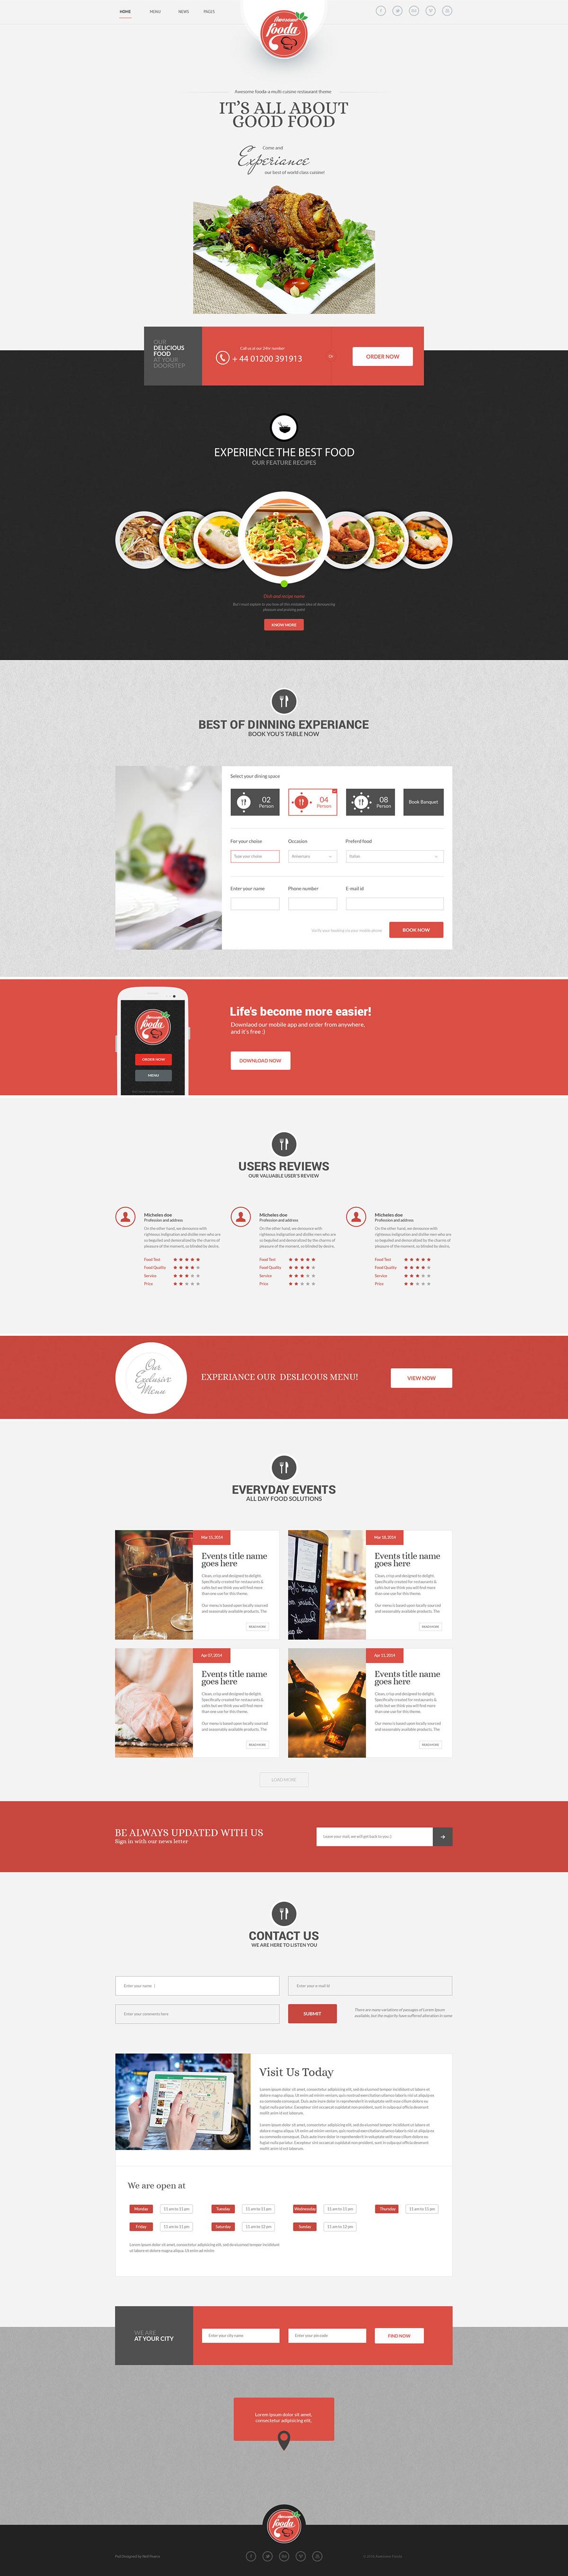 Theme Design photoshop Website